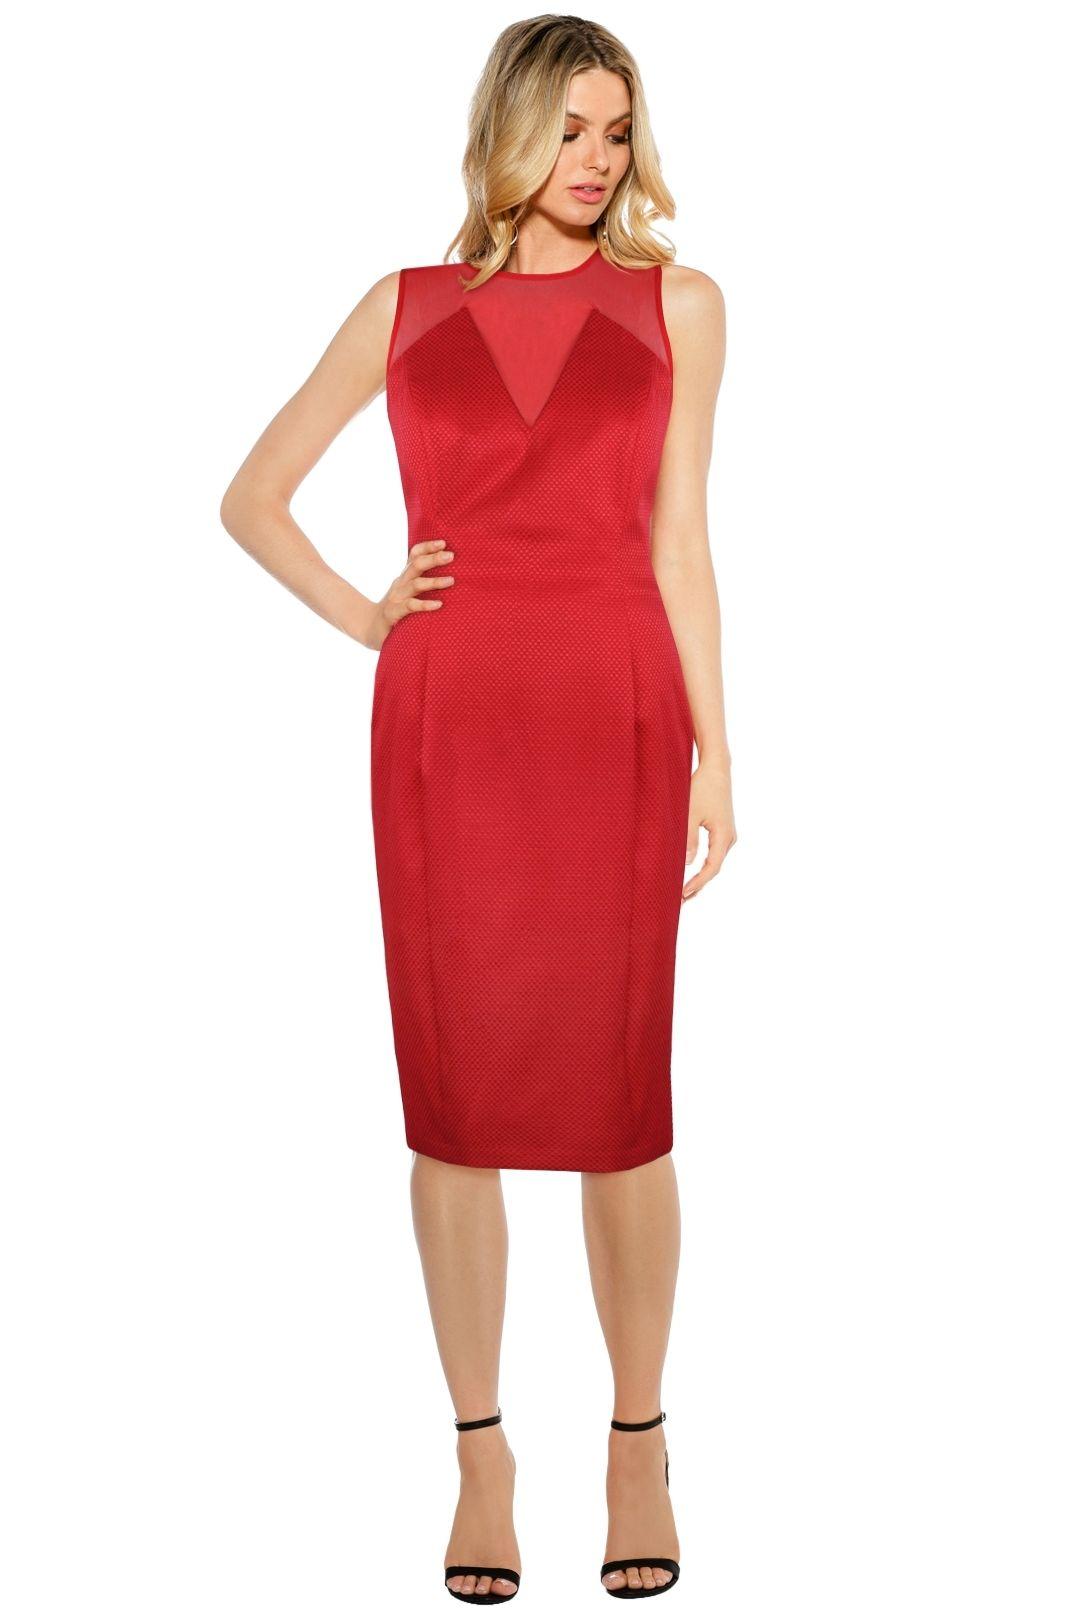 Anna Scholz - Checker Tailoring Mesh Insert Dress - Red - Front